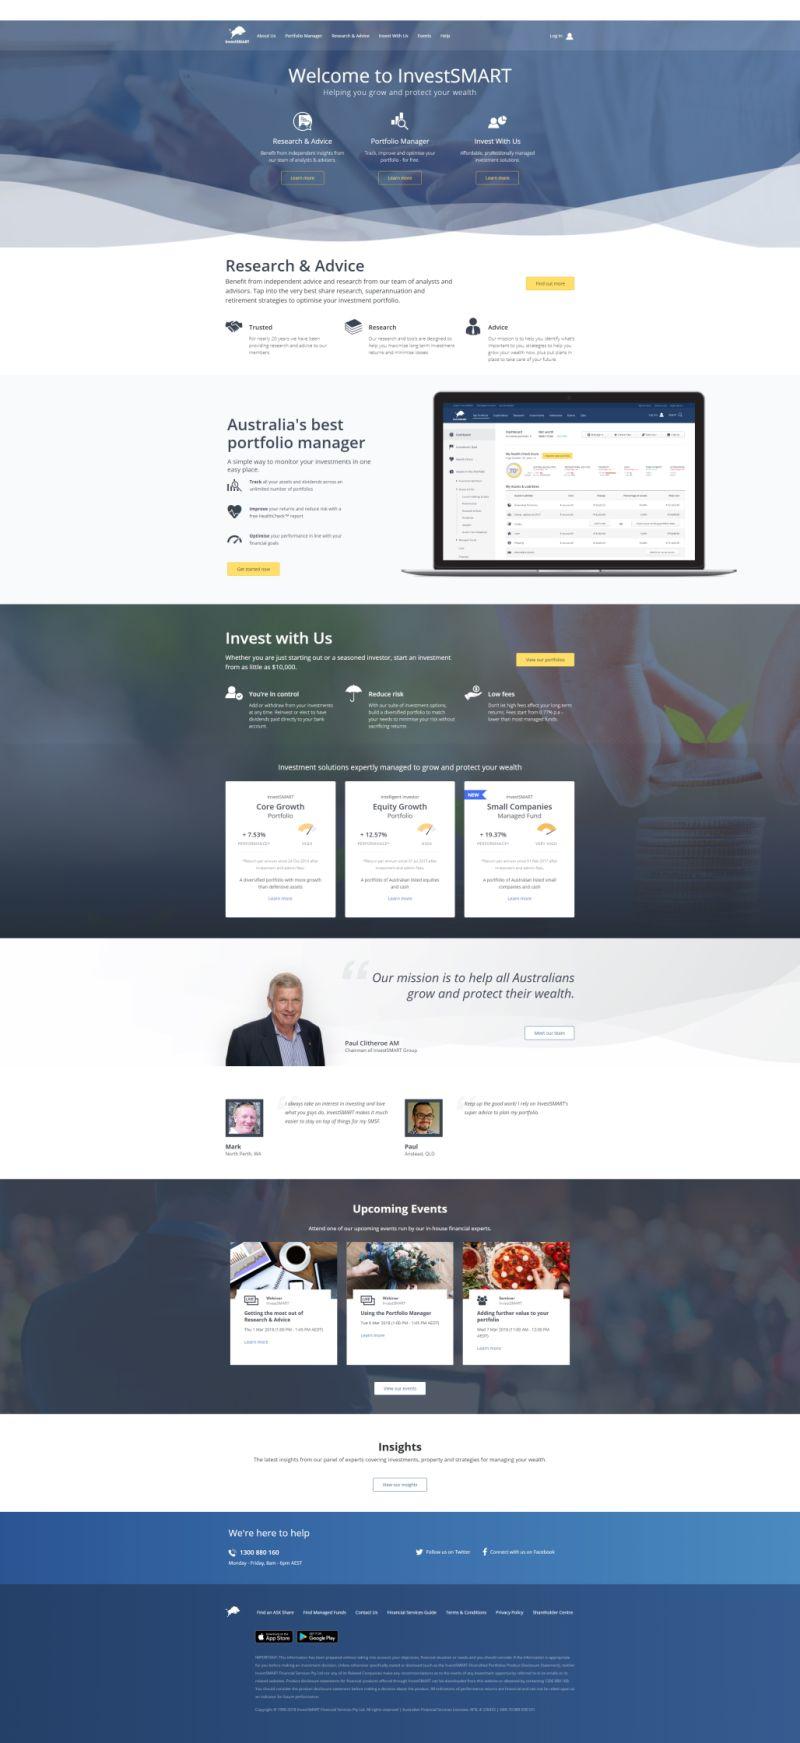 InvestSMART website in 2018